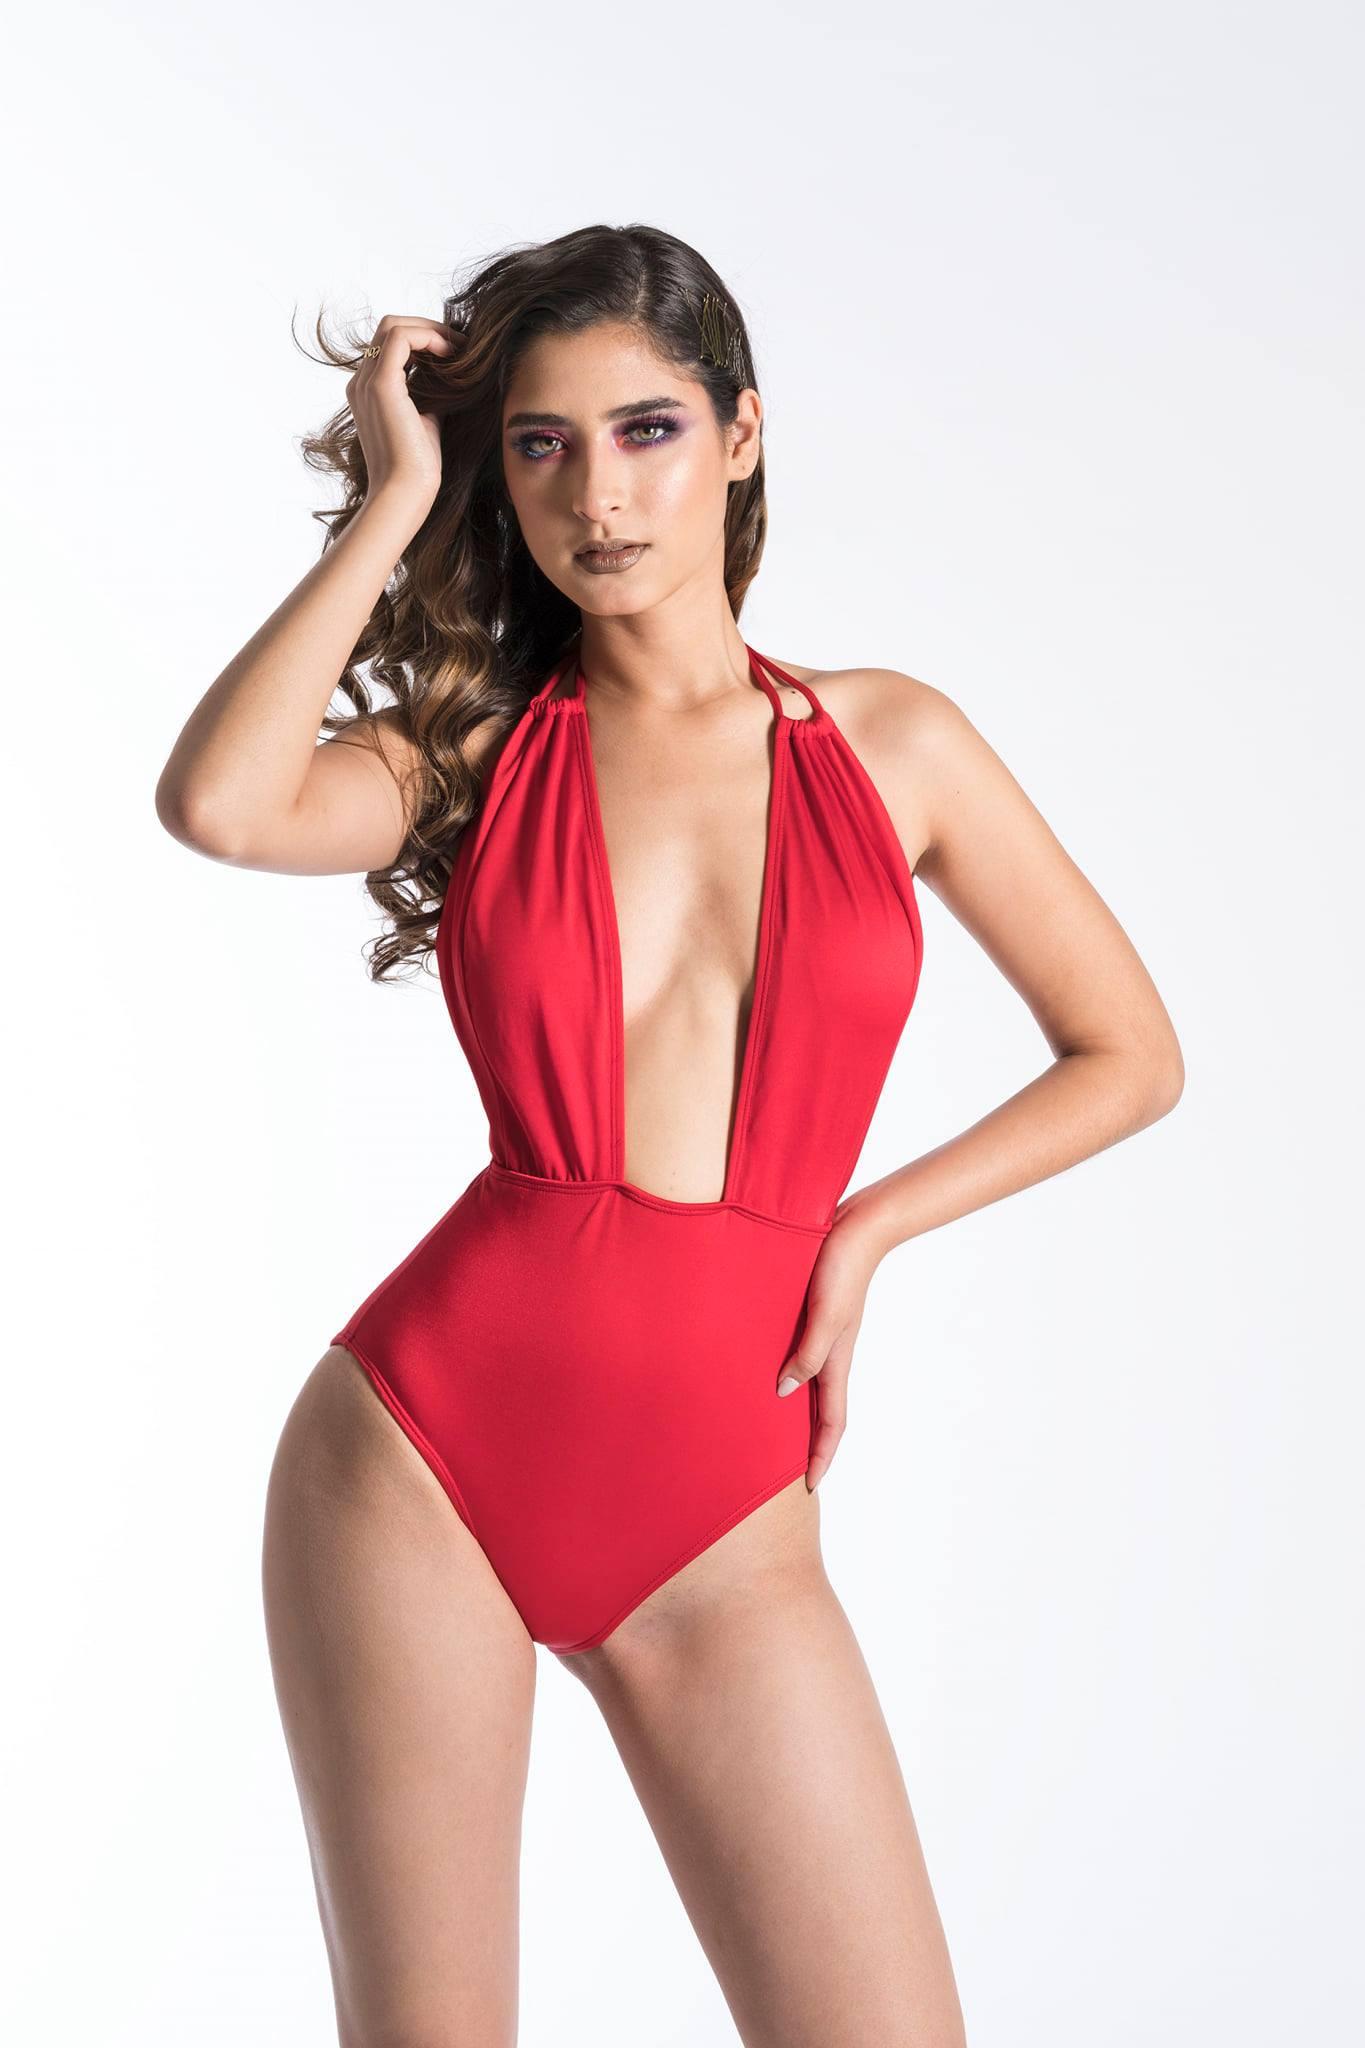 angela leon yuriar, miss grand mexico 2020. - Página 9 Pbkpo10